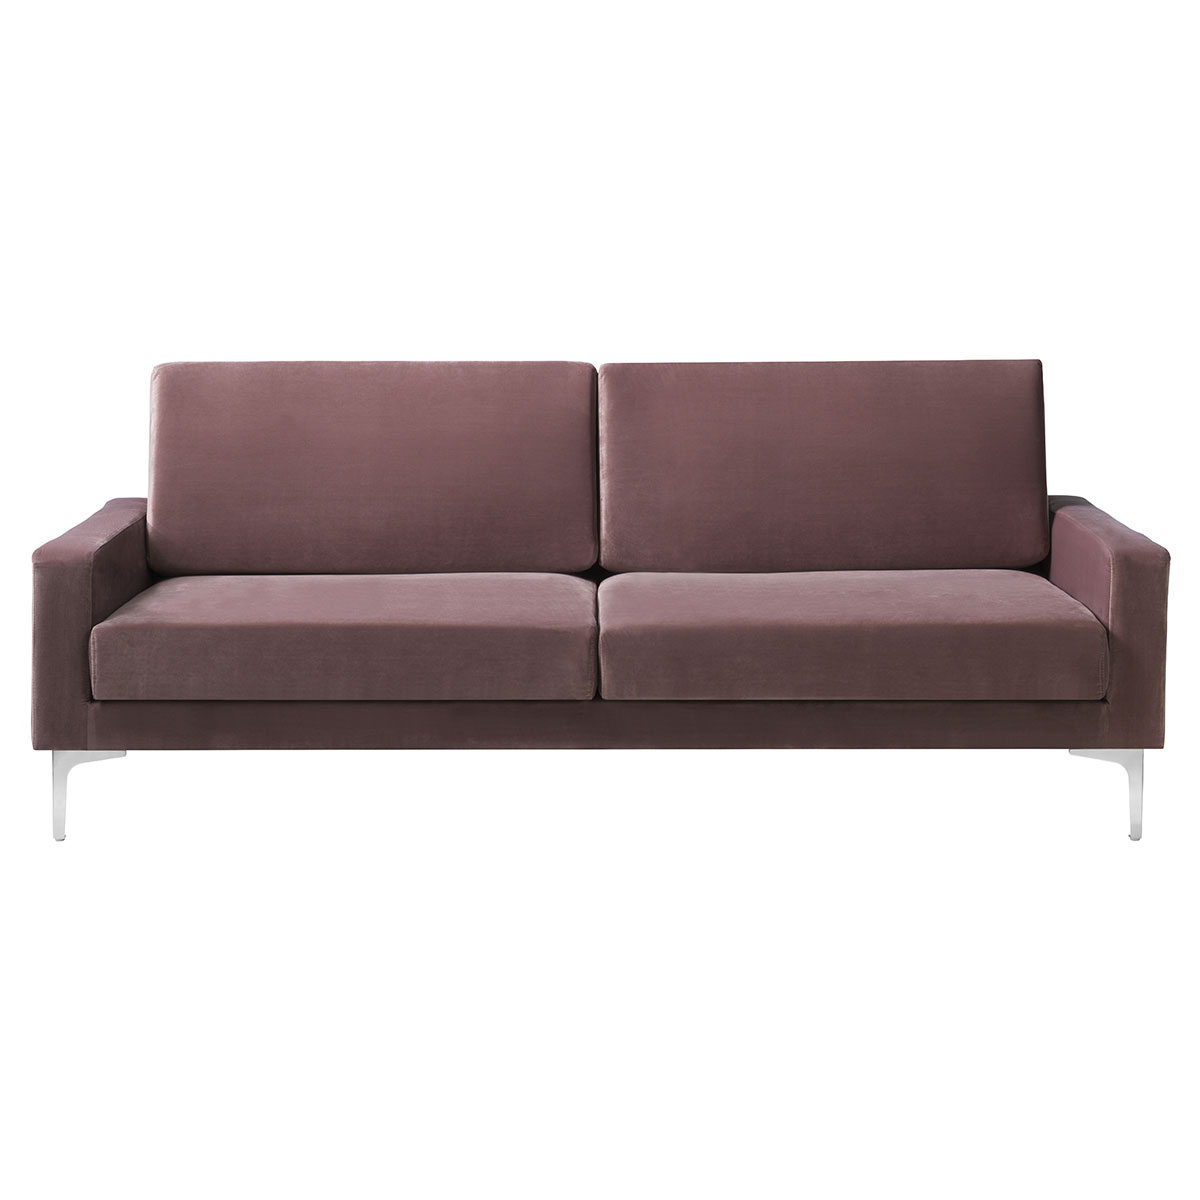 Living&more 3 pers. sofa - Viktoria - Nude